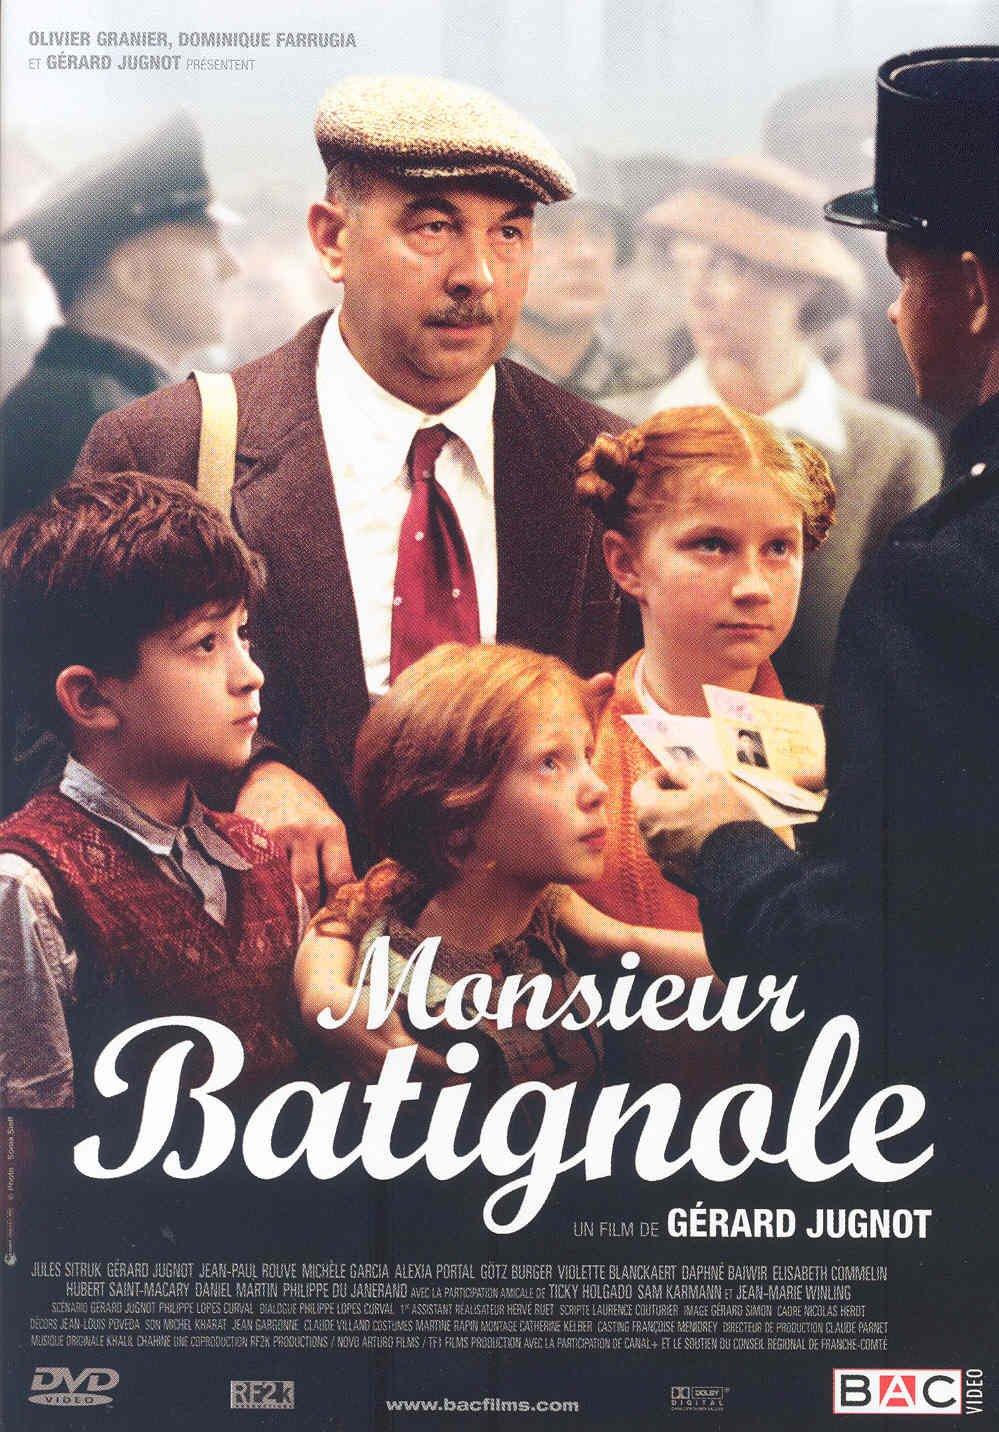 Monsieur Batignole 2002 Trama Citazioni Cast E Trailer